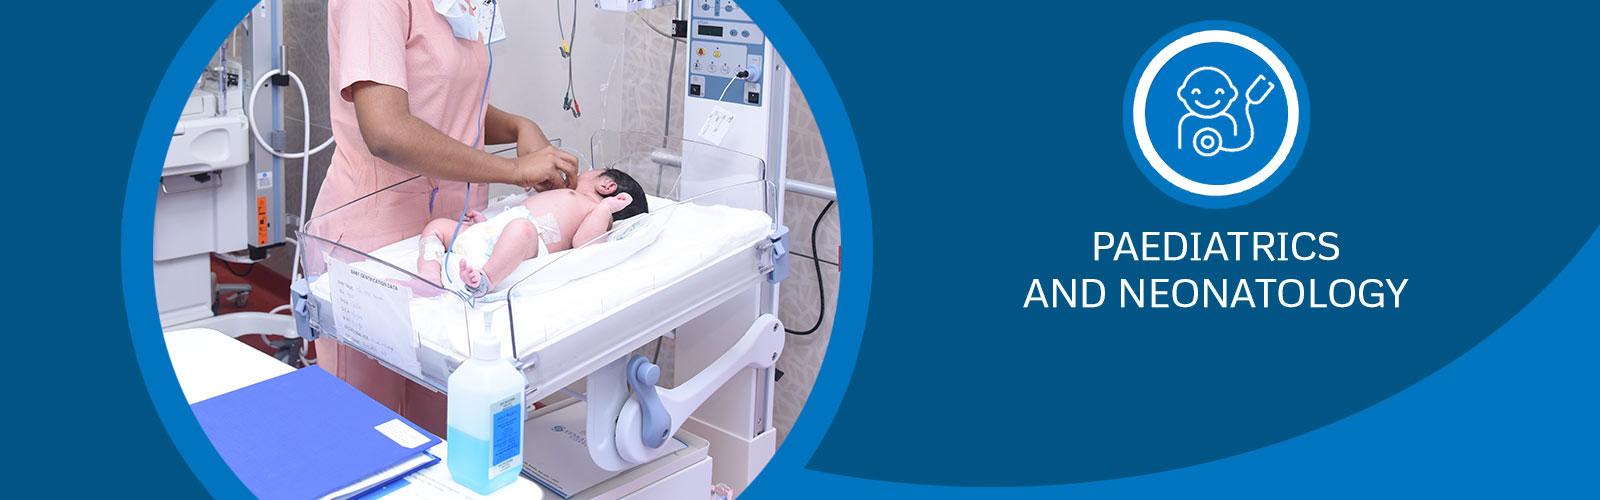 paediatrics cardiology- venkateshwar Hospital